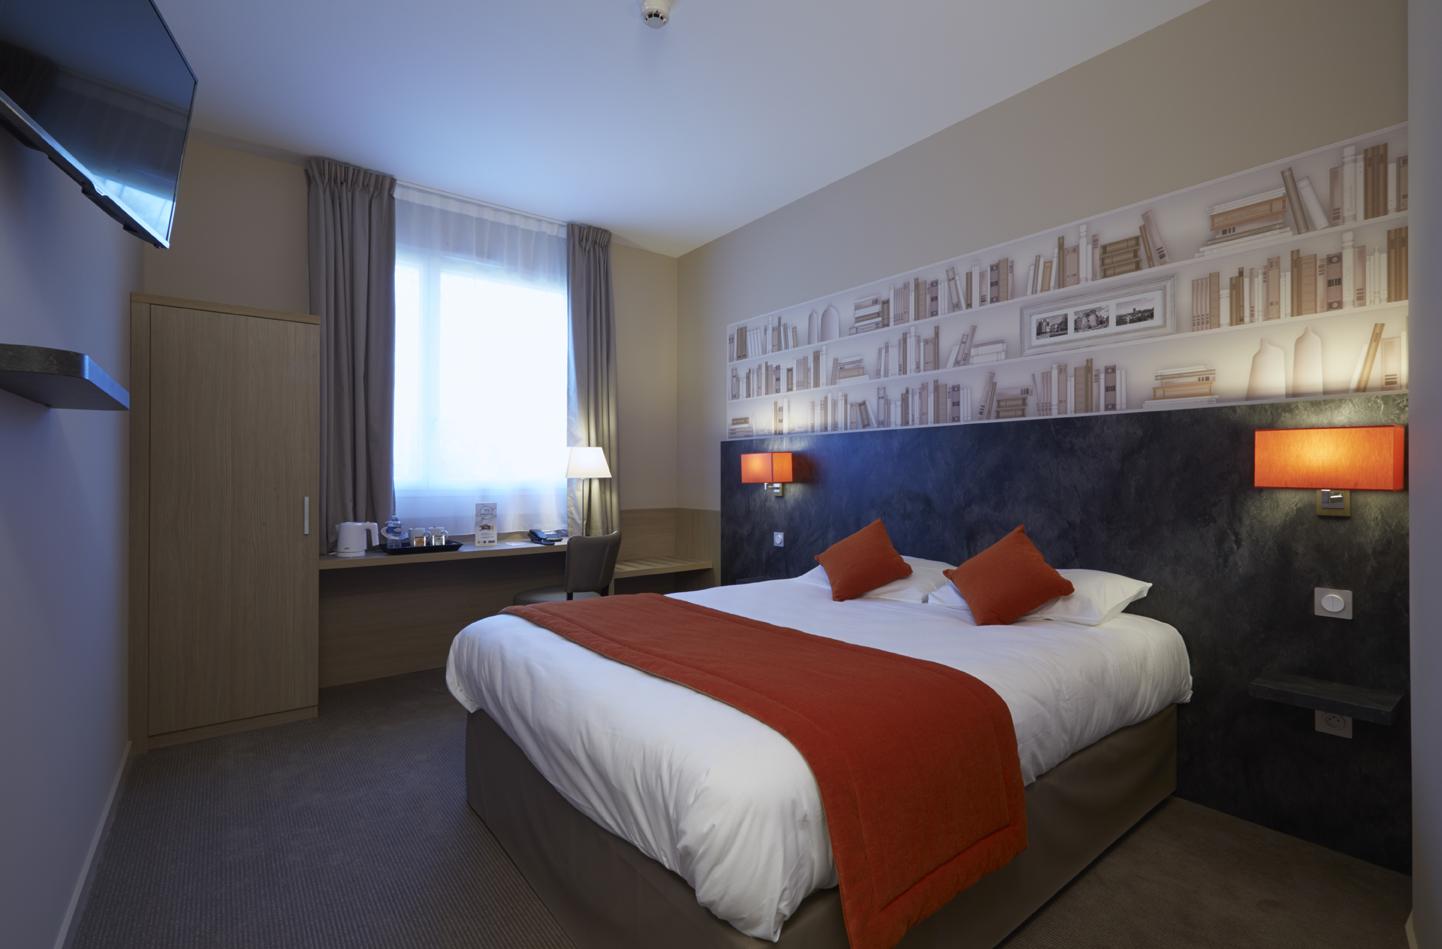 hotel kyriad angers beaucouze - géraldine fourny - decoratrice d interieur nantes 44 - décoration hotel